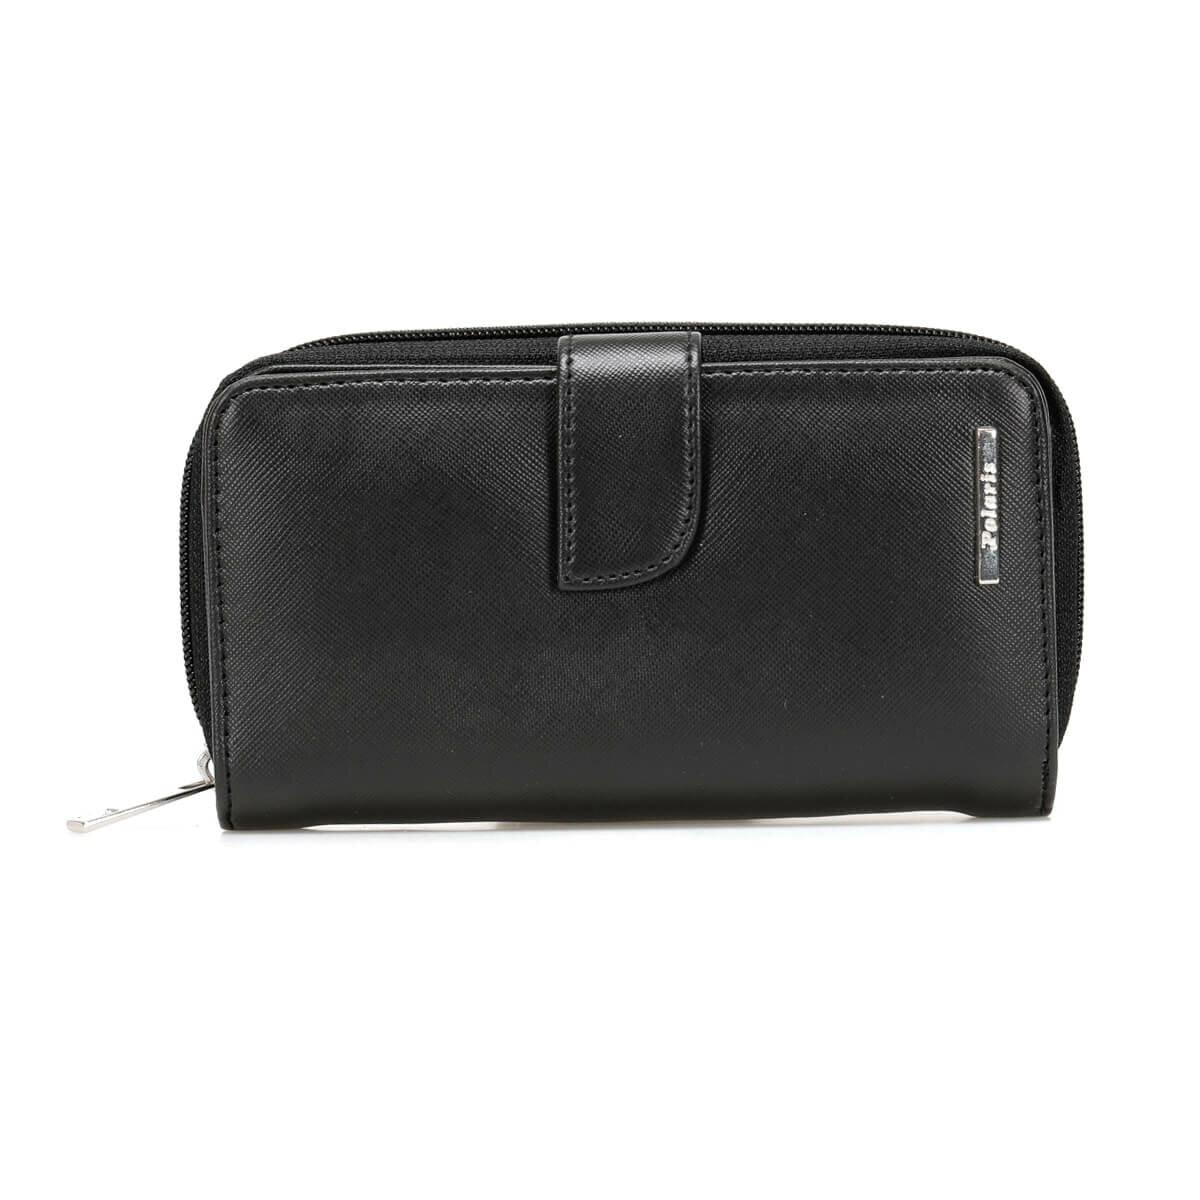 FLO 91.968. 002.D Black Women 'S Wallet Polaris